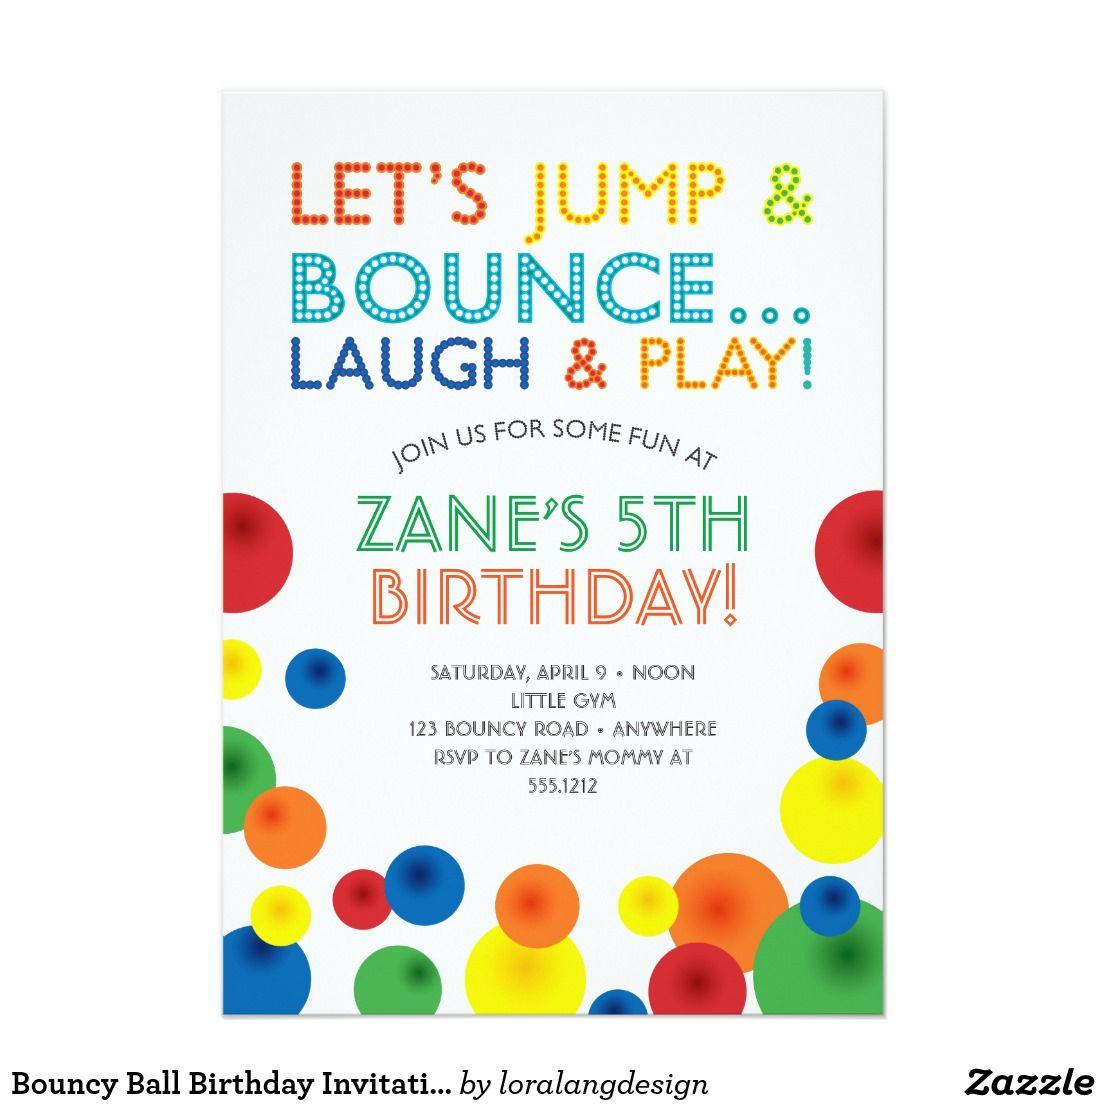 Bouncy Ball Birthday Invitation | Invitation cards | Pinterest ...